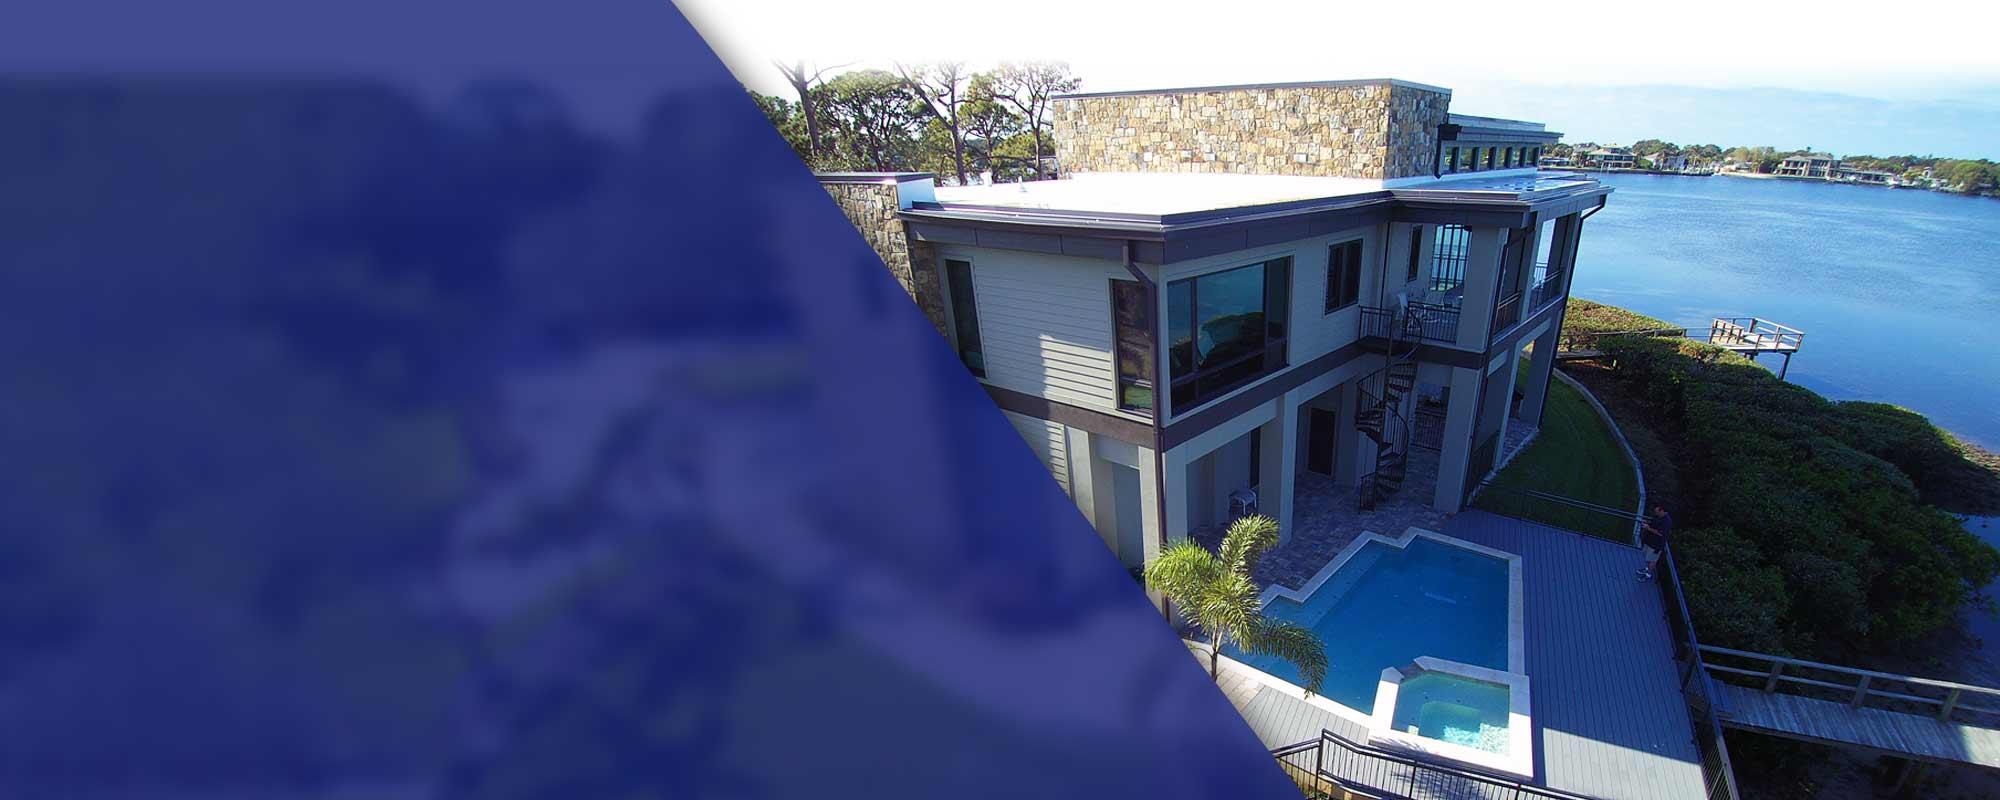 aj-contracting-custom-homes-slider